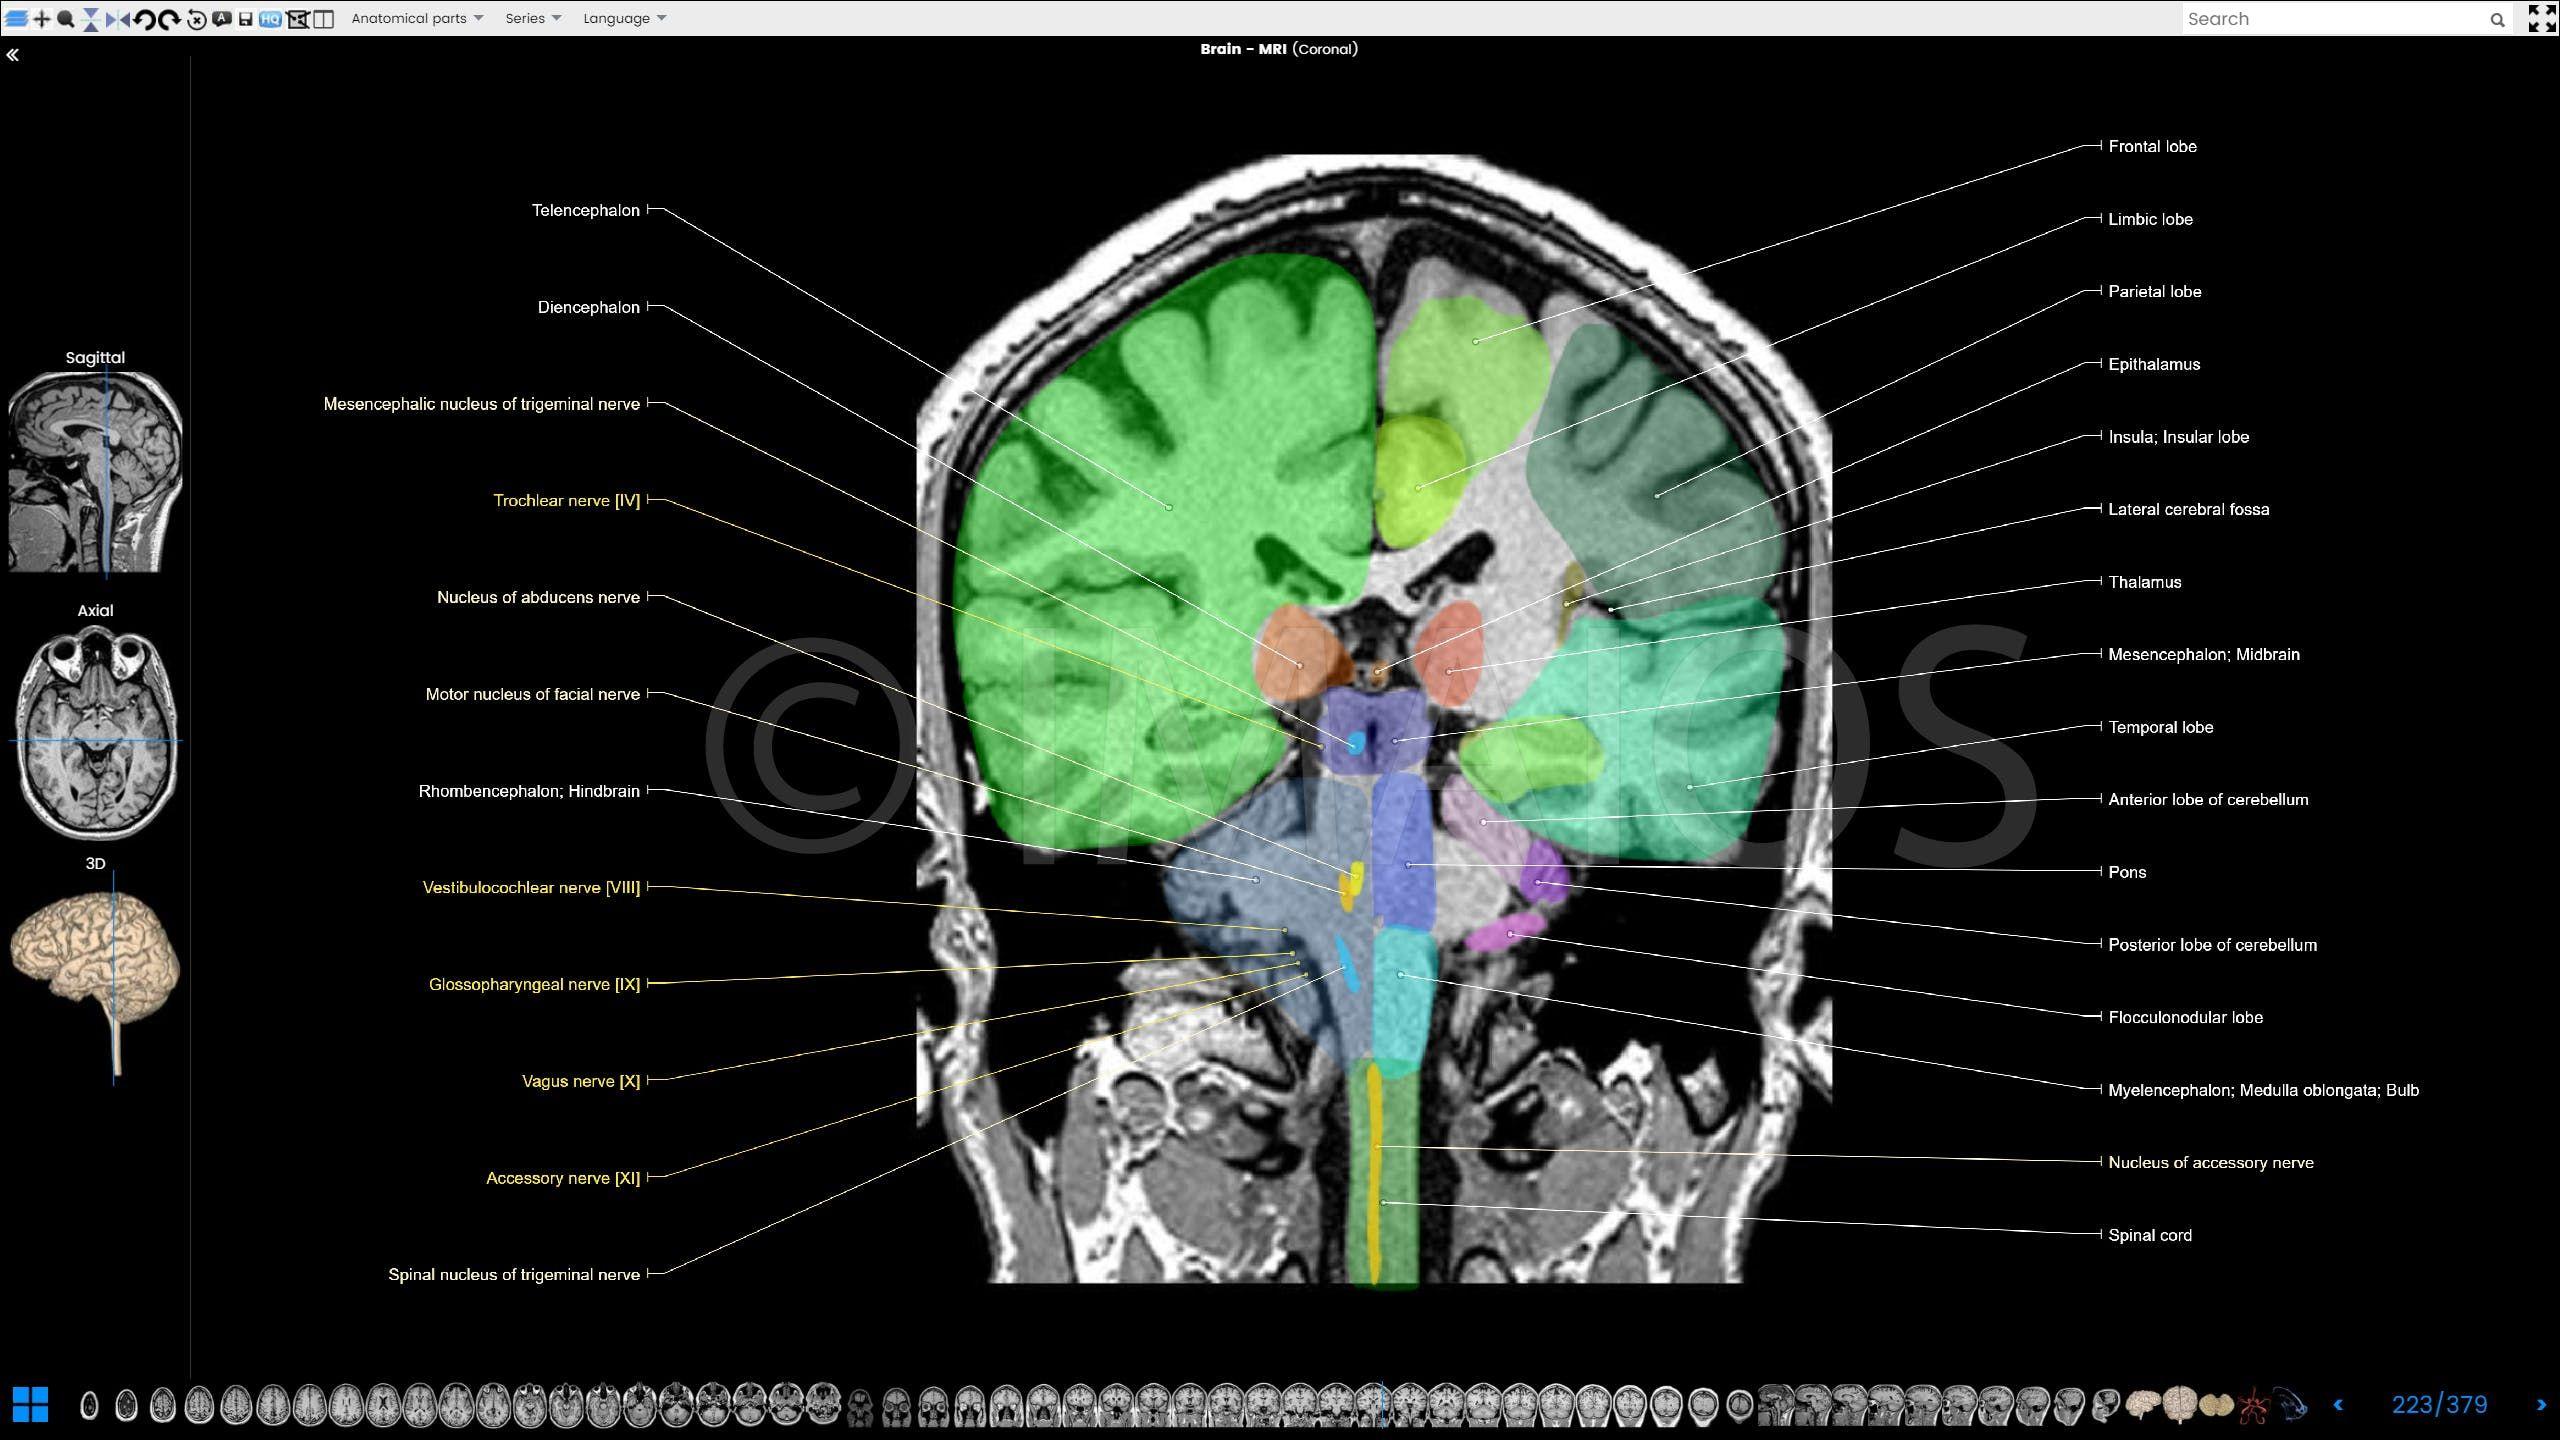 anatomy of the encephalon in mri (axial, coronal and ... mri brain spine diagram